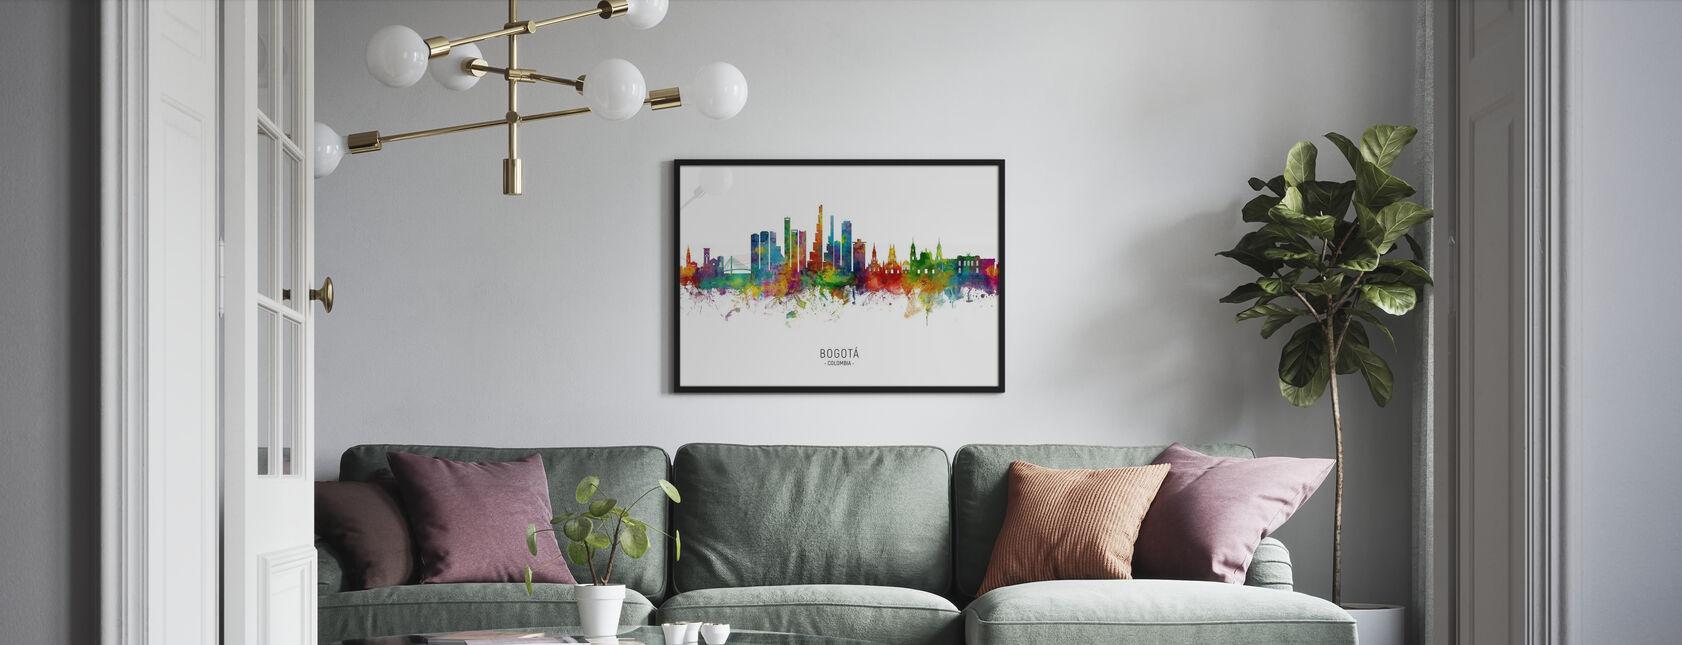 Bogotá Colombias skyline - Plakat - Stue